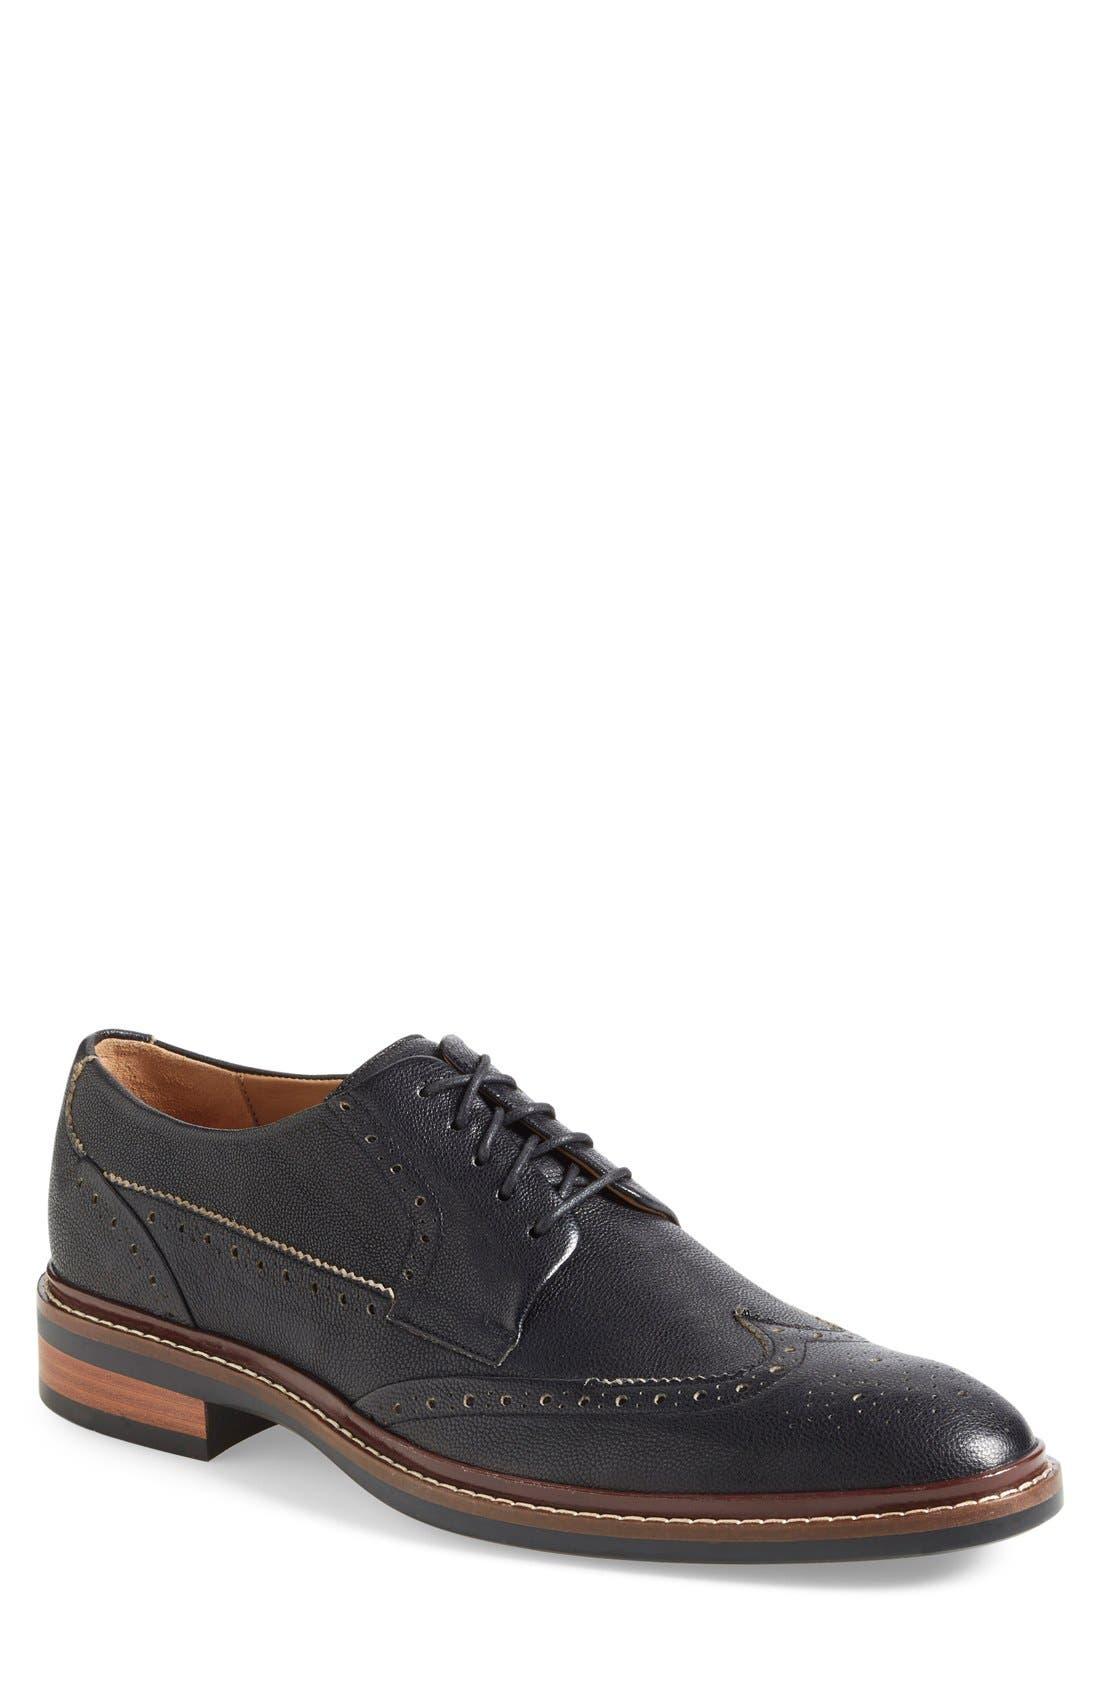 Warren Welt Wingtip,                         Main,                         color, Black Mill Leather